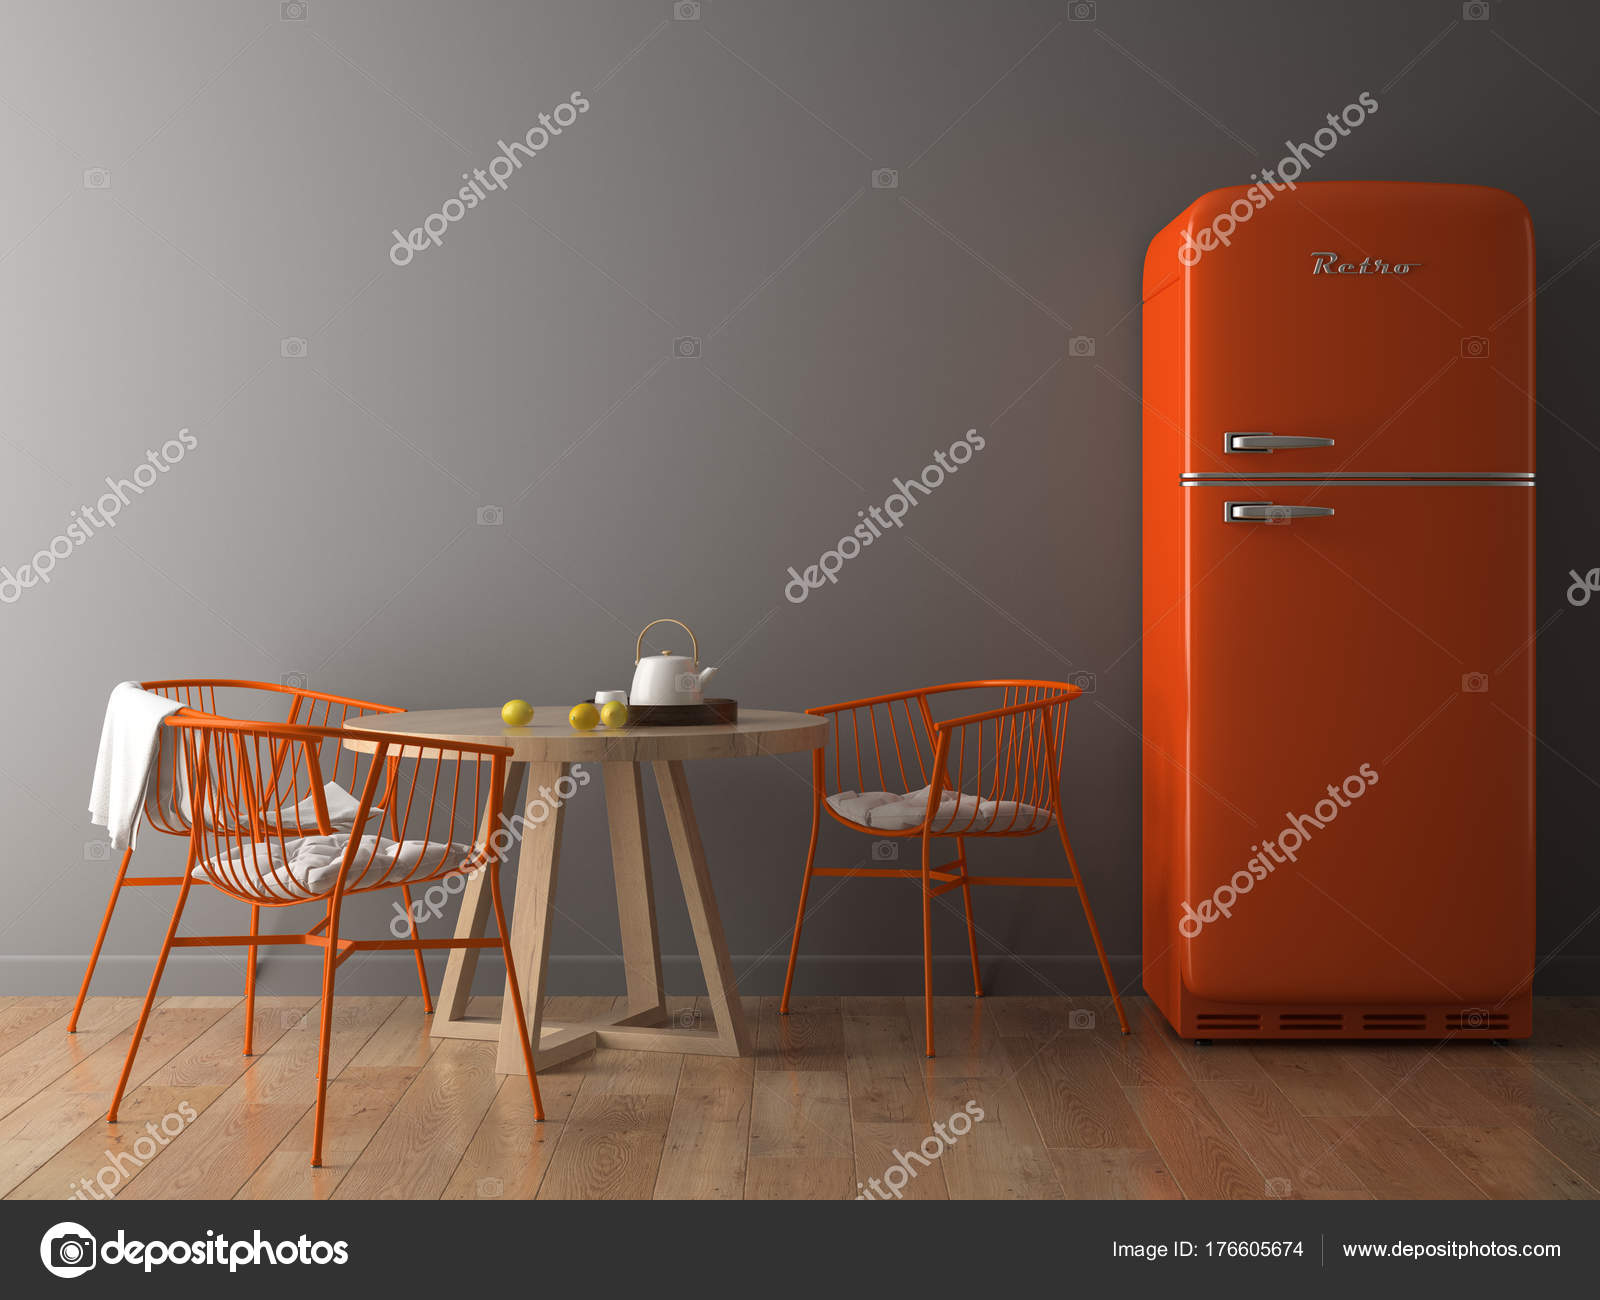 Retro Kühlschrank Orange : Retro kühlschrank orange retro kühlschrank kaufen auf ricardo